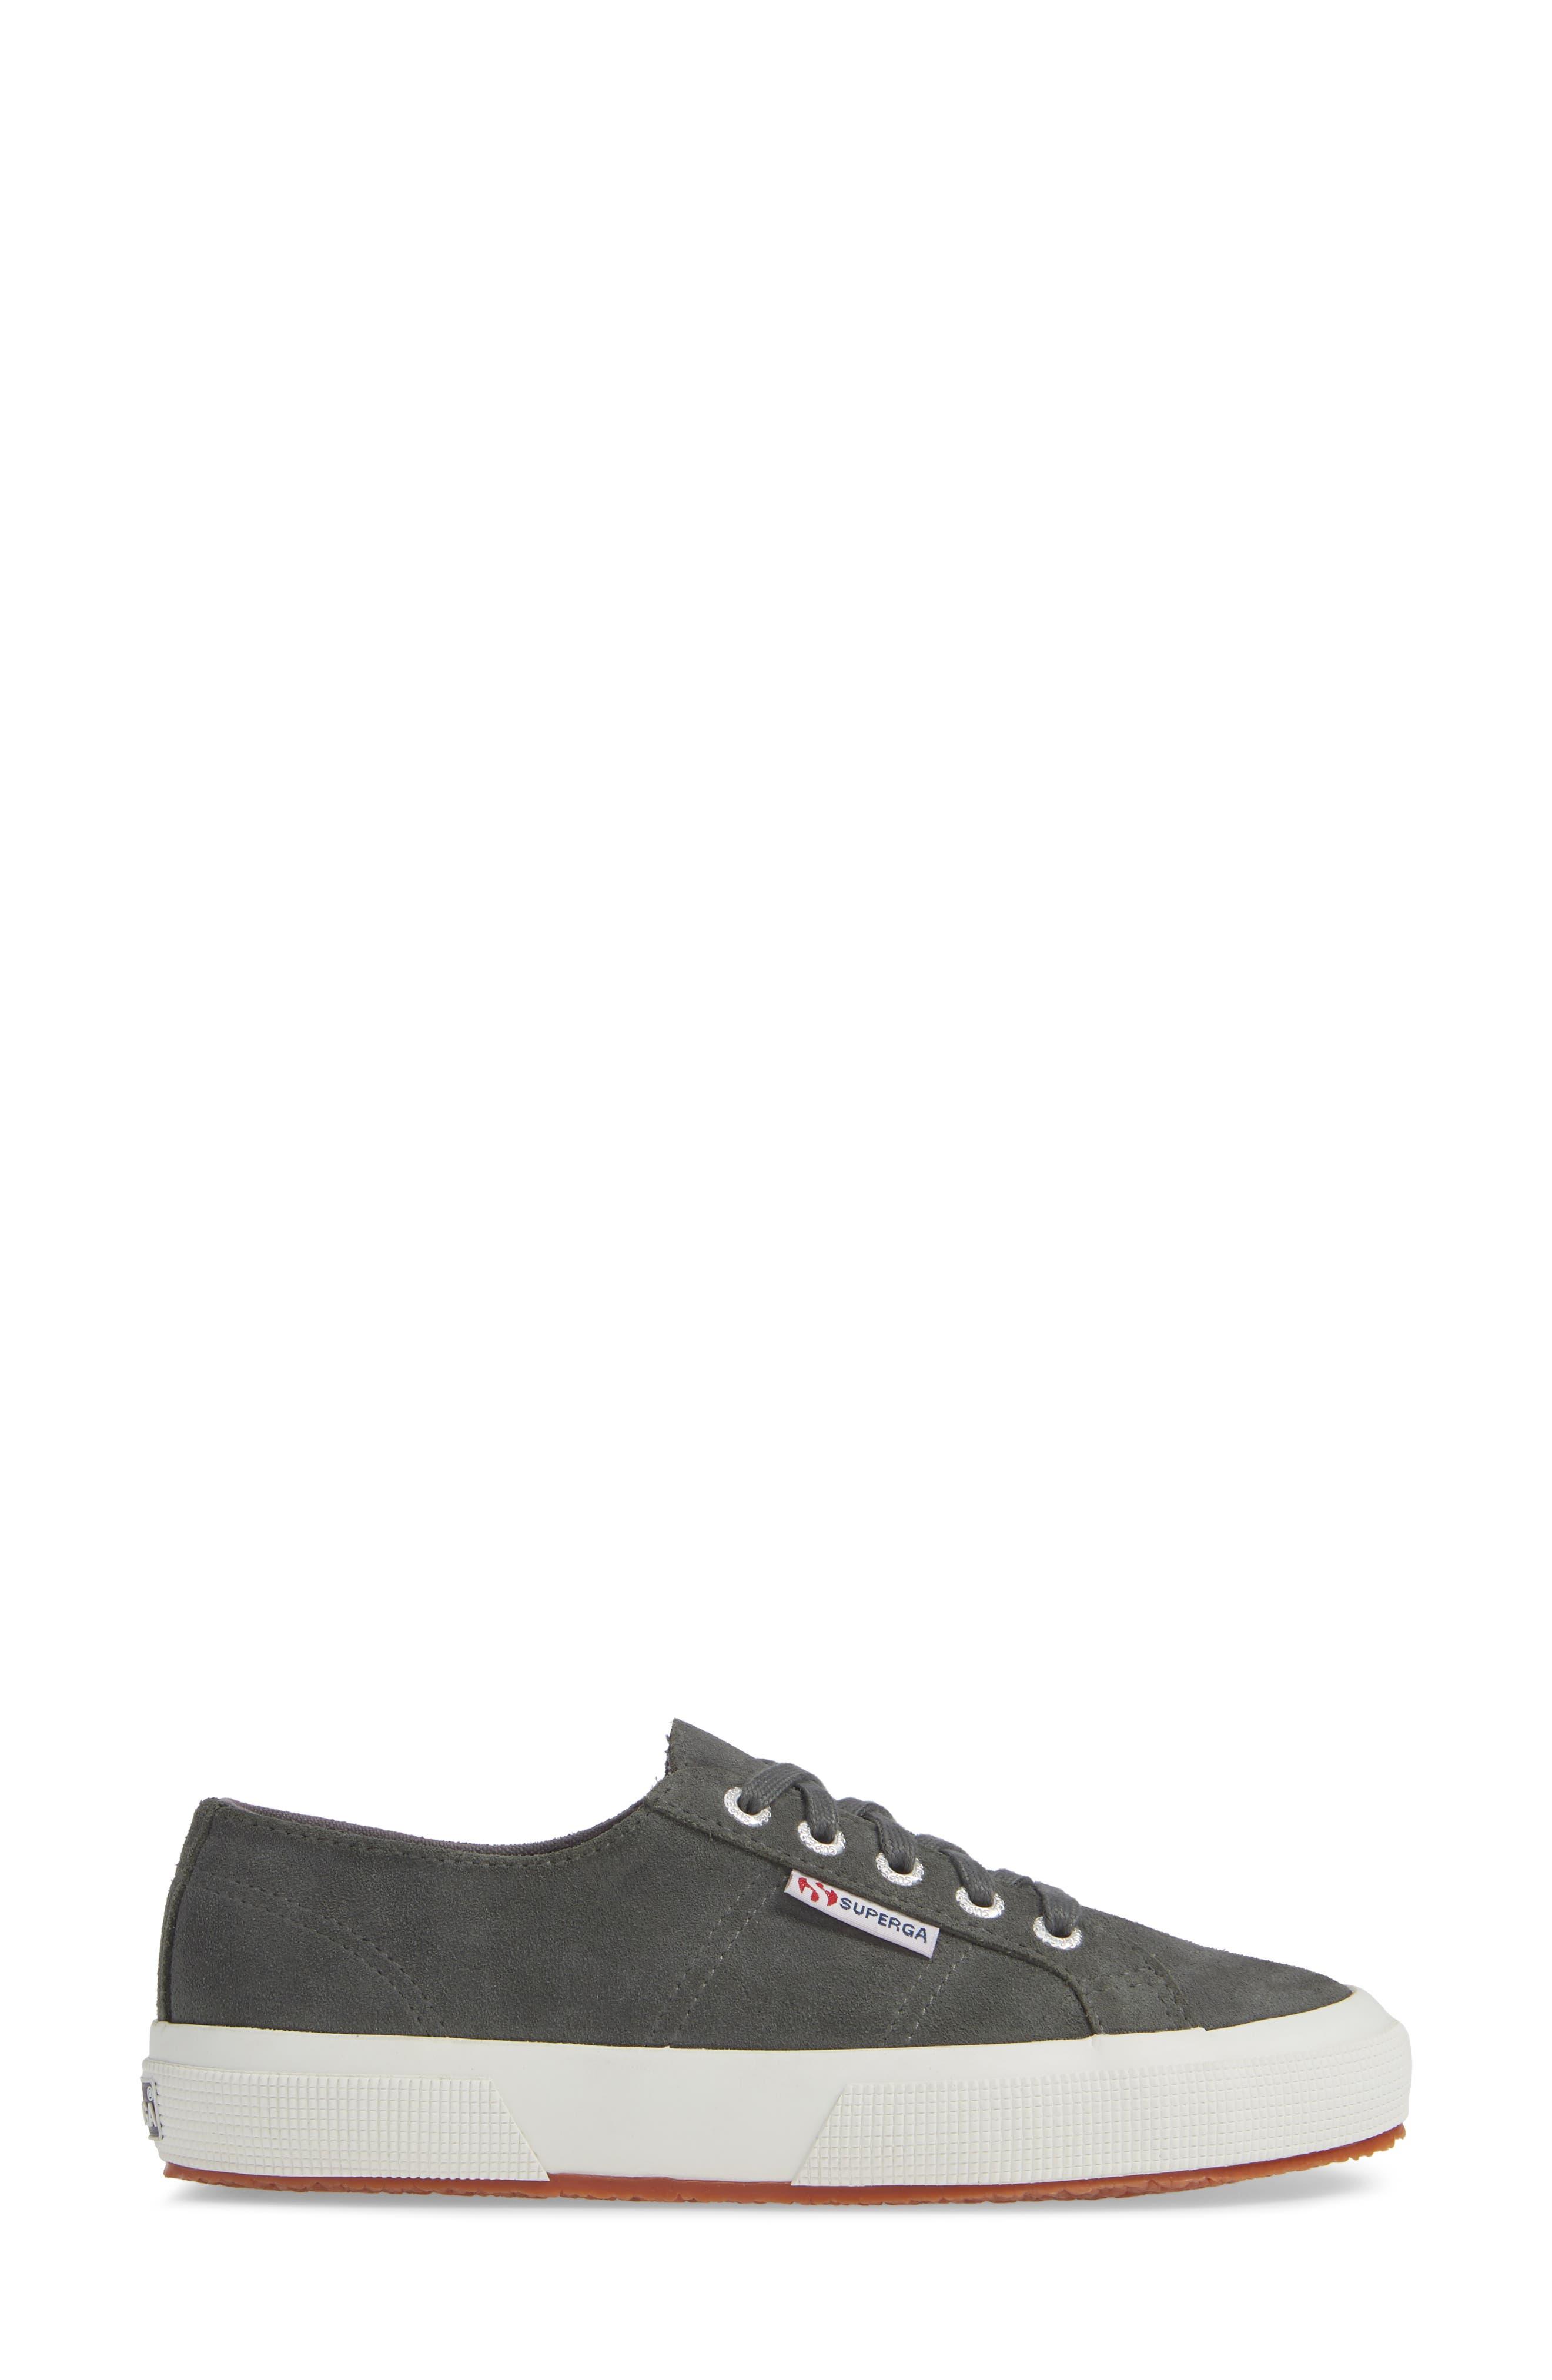 2750 Suecotw Low Top Sneaker,                             Alternate thumbnail 3, color,                             DARK GREY SUEDE